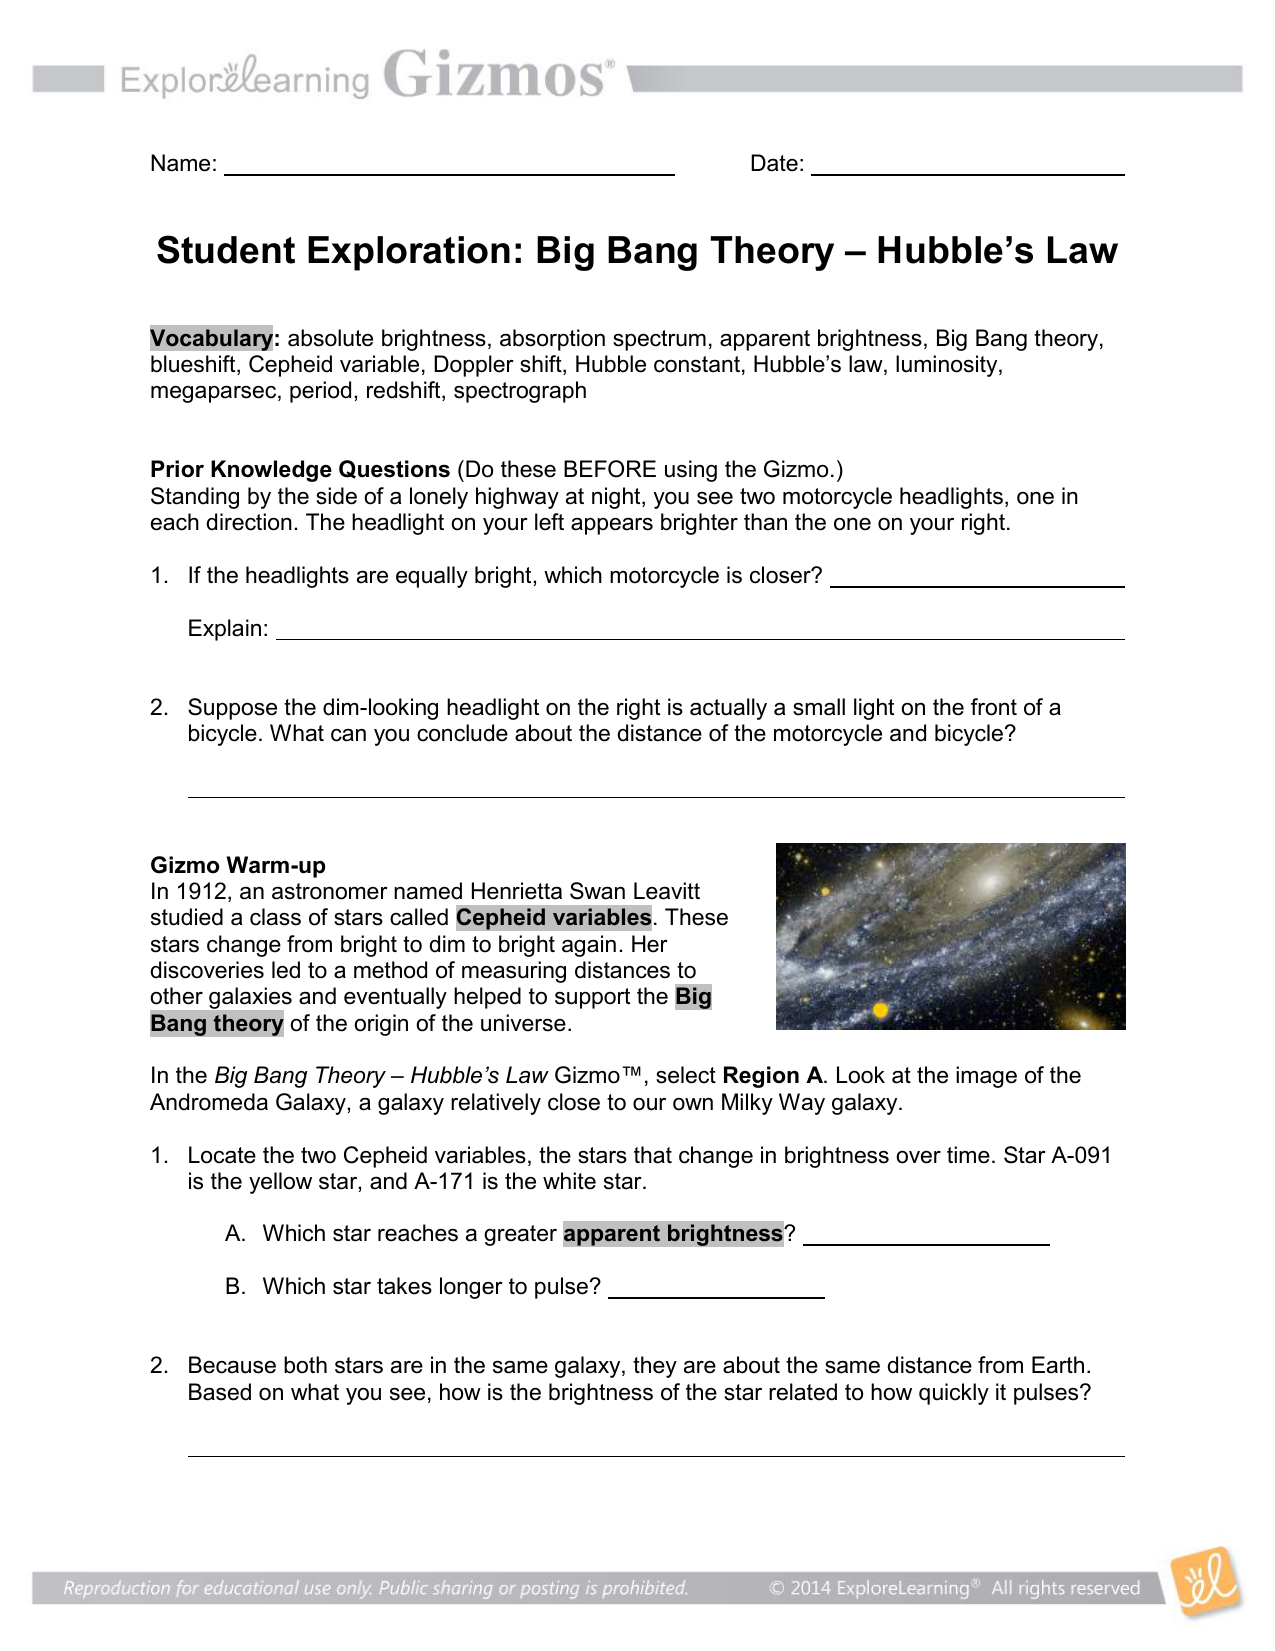 Student Exploration Hr Diagram Answers - Ekerekizul